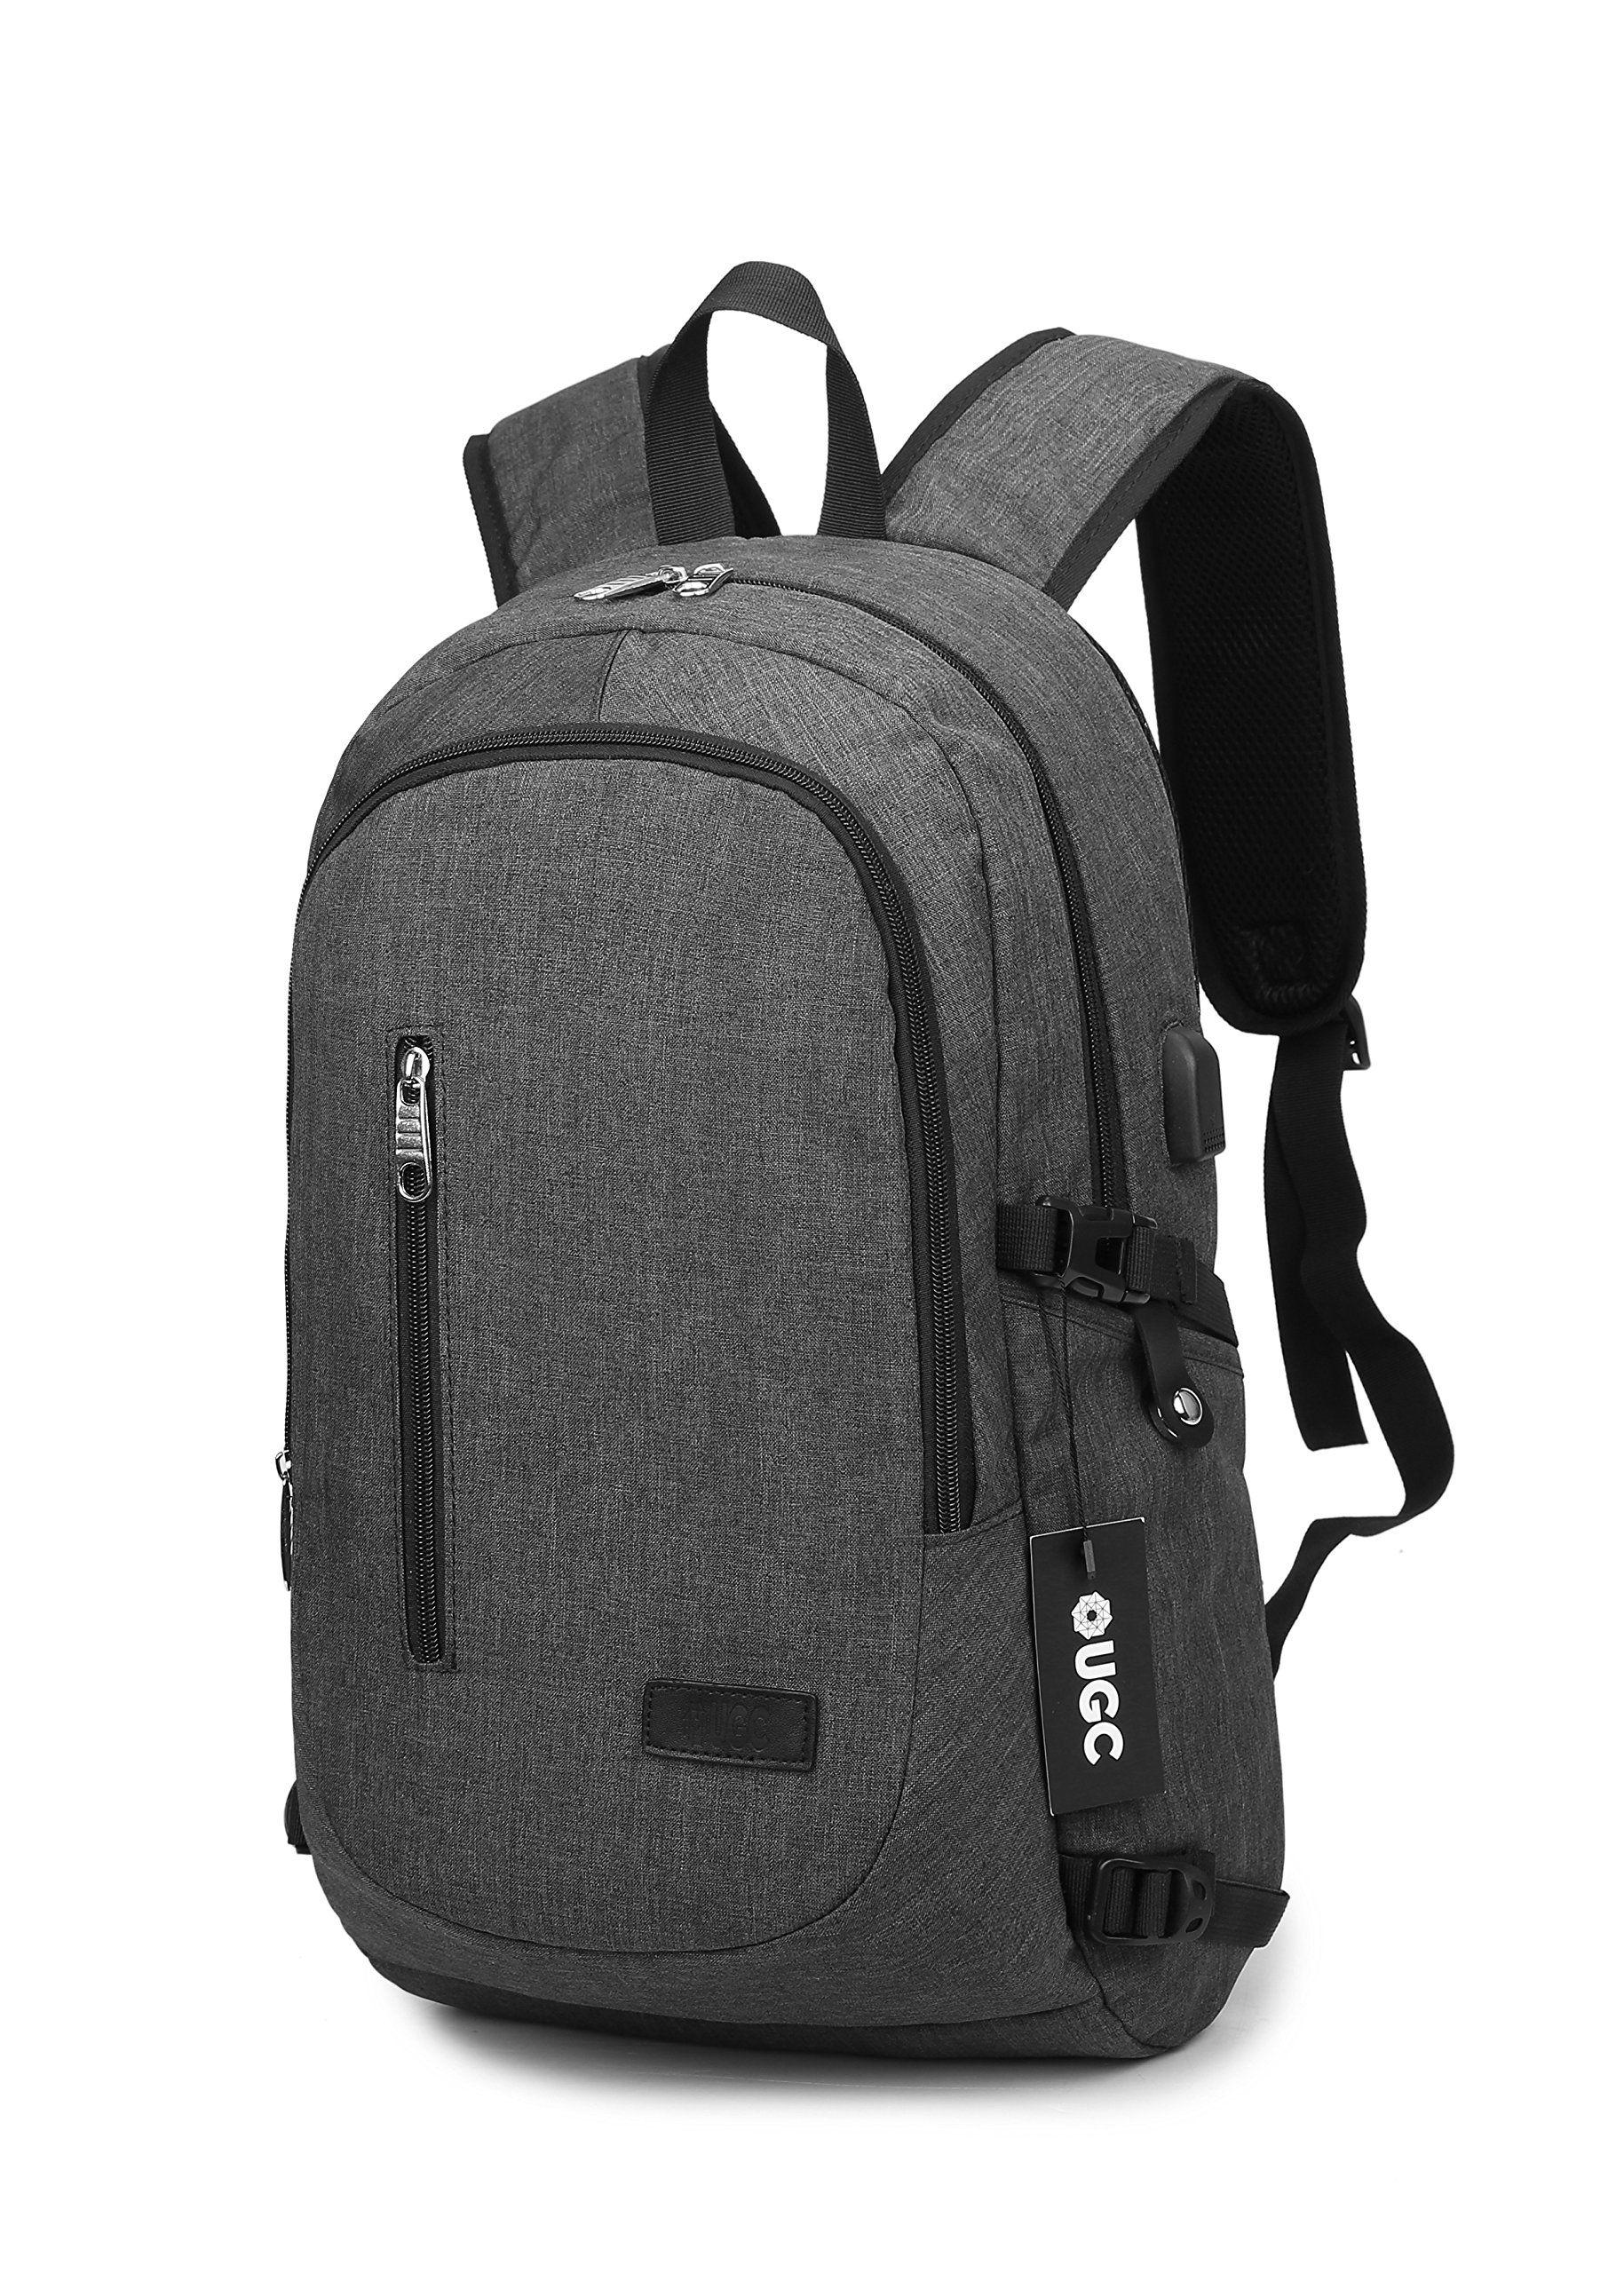 Best 17 Inch Laptop Backpack Uk- Fenix Toulouse Handball 0c8ac61e52aa7